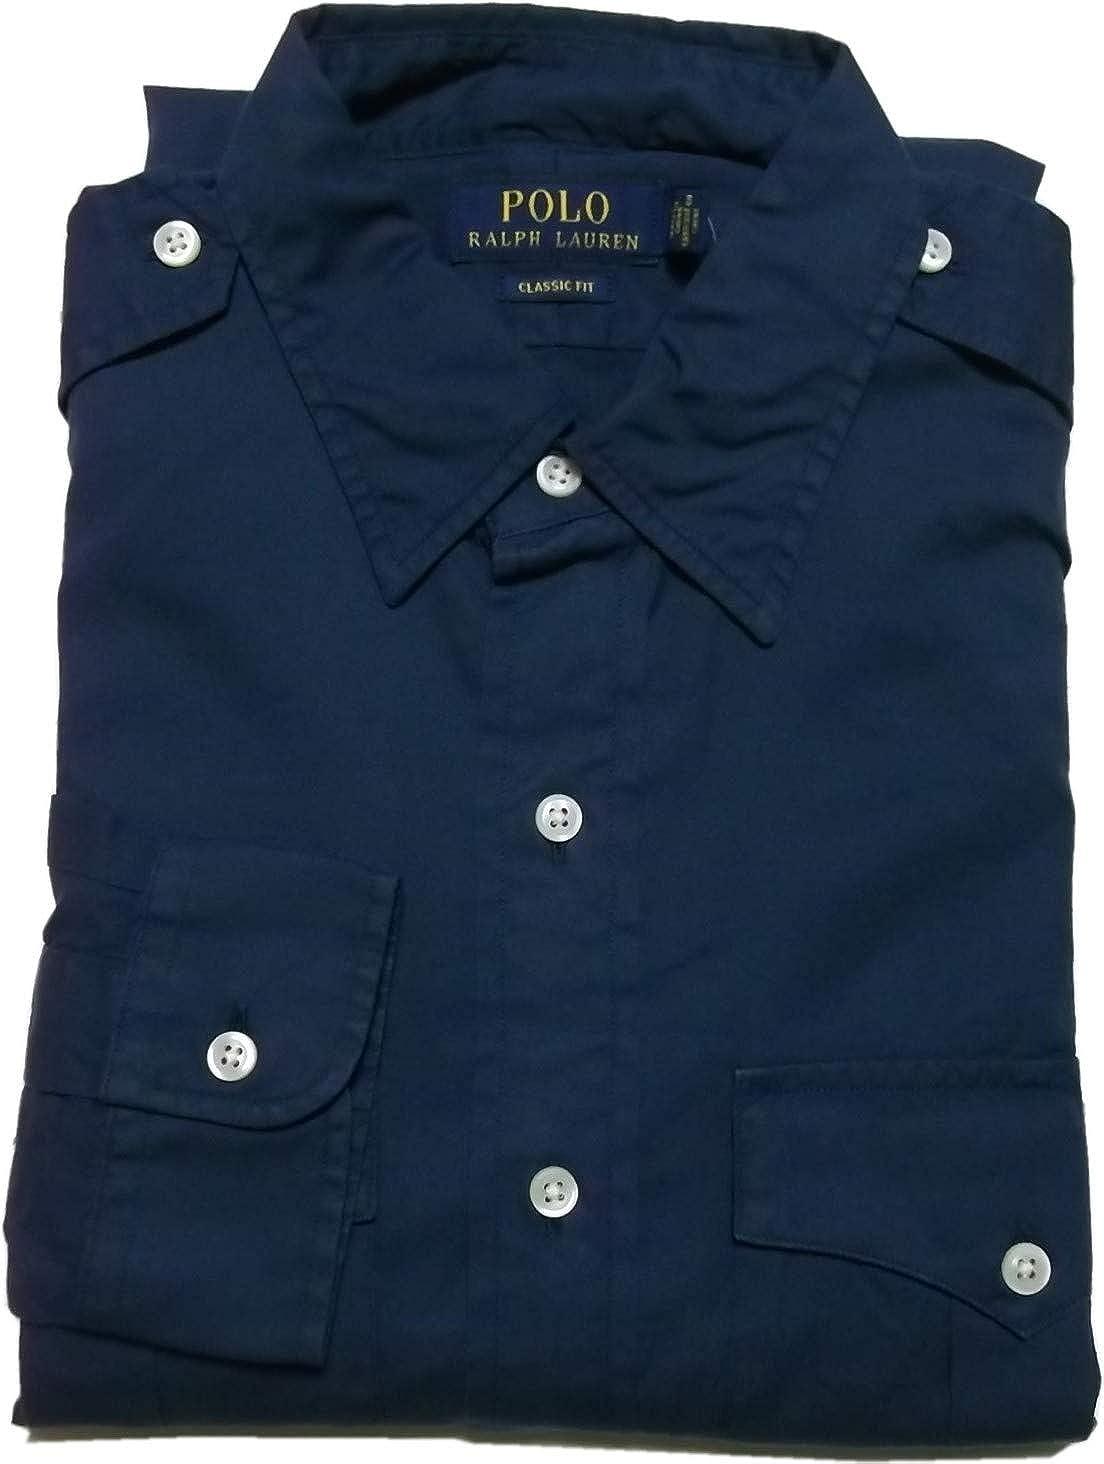 Ralph Lauren Polo Mens Classic Fit Button Down Safari Shirt Navy